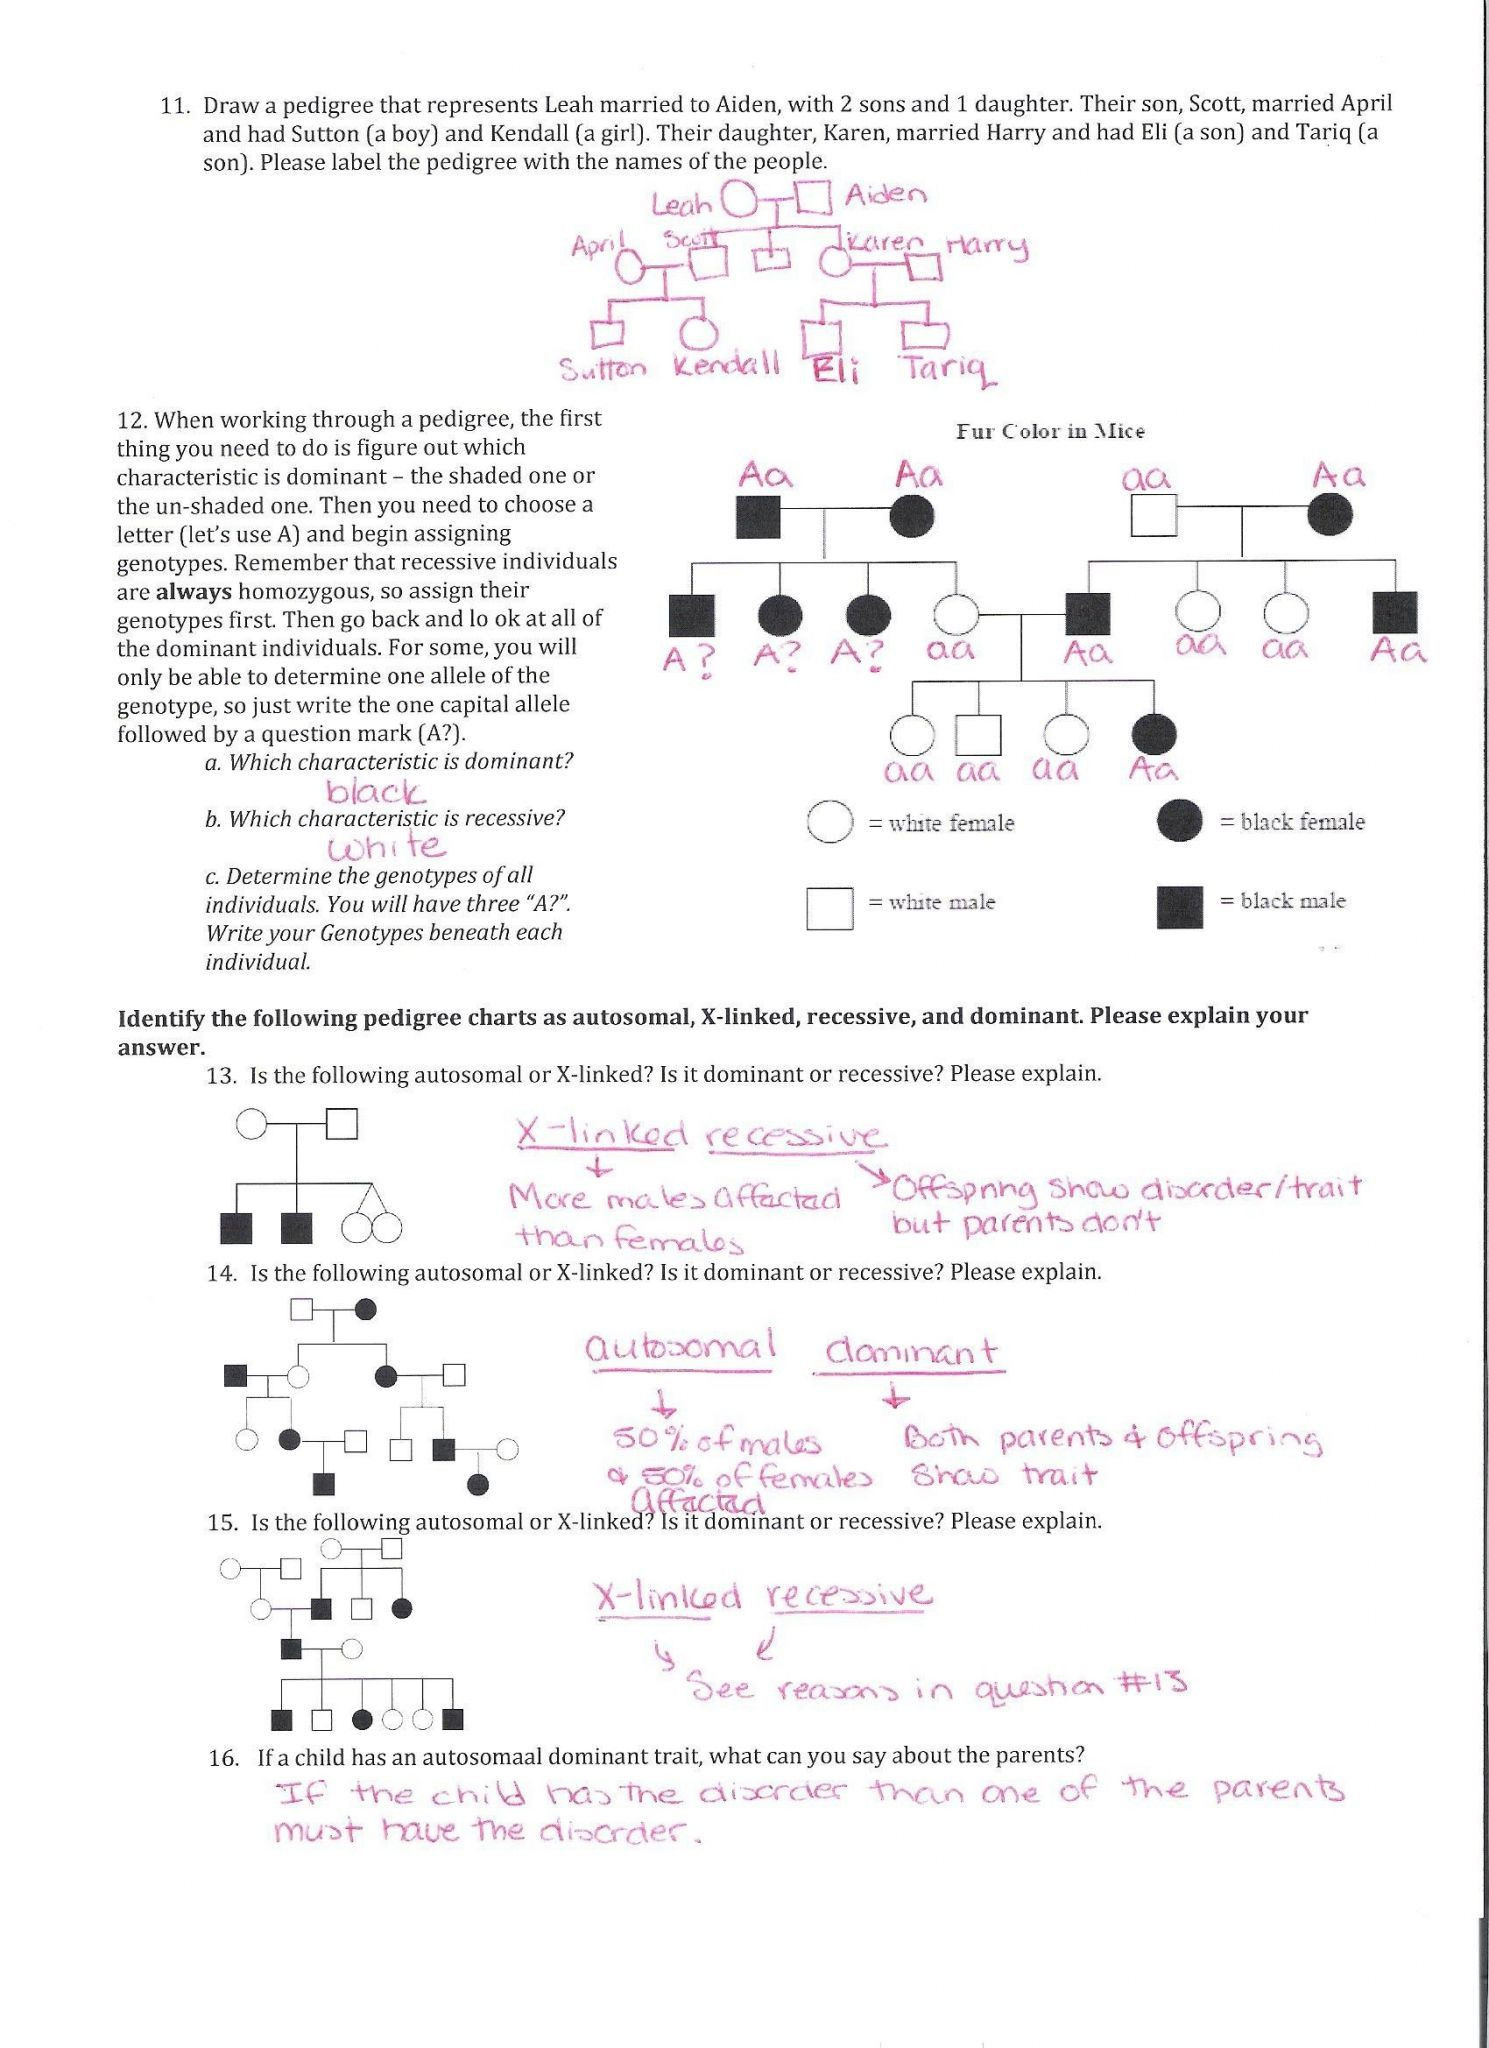 Genetics Pedigree Worksheet Answer Key With images